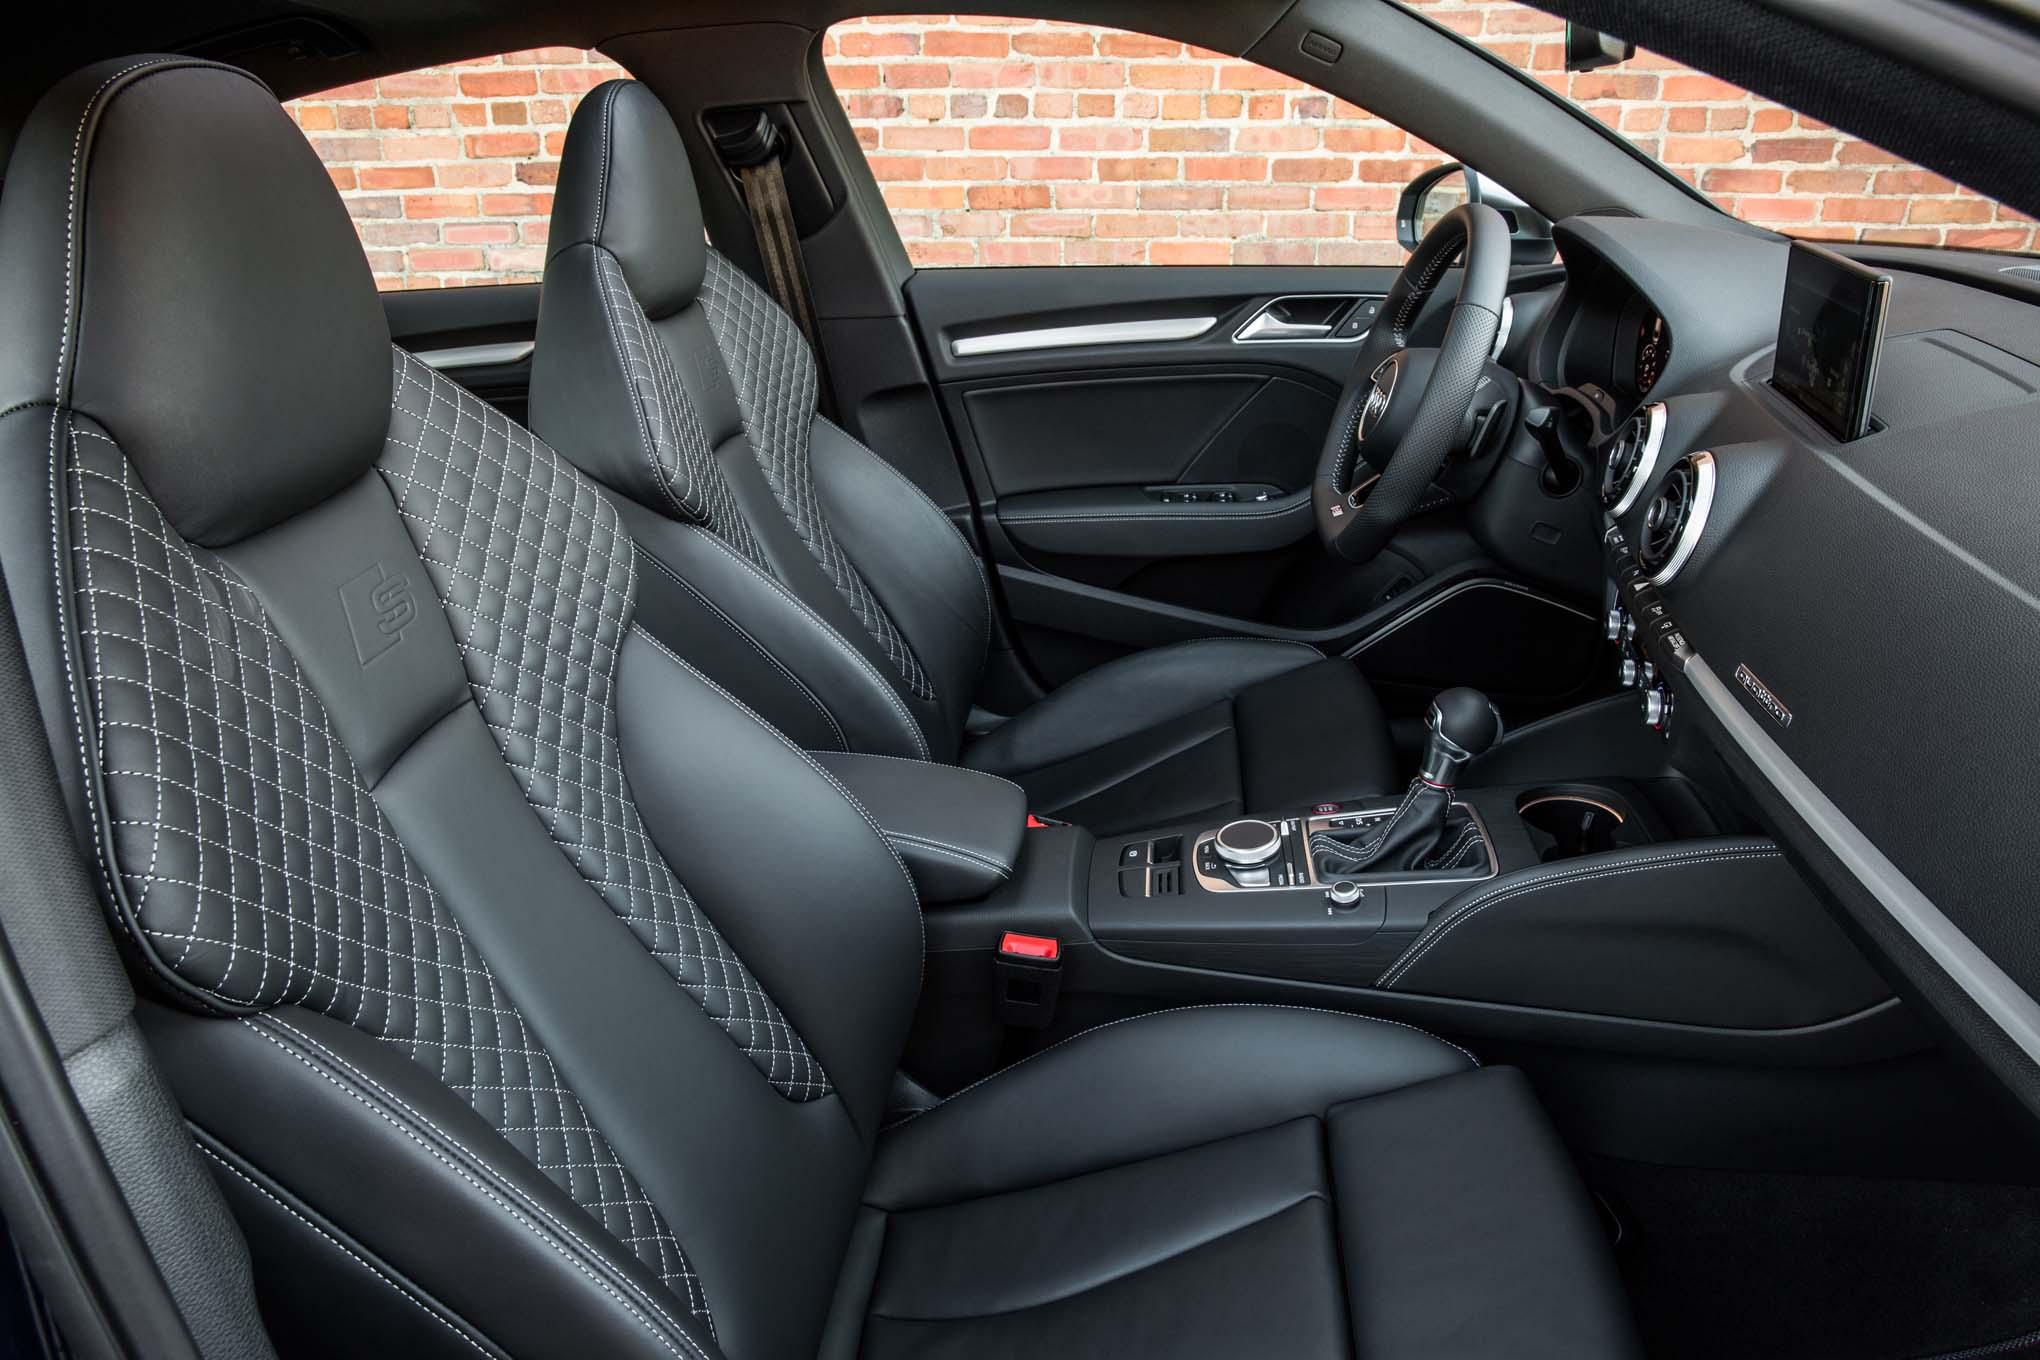 2017-Audi-S3-front-interior.jpg